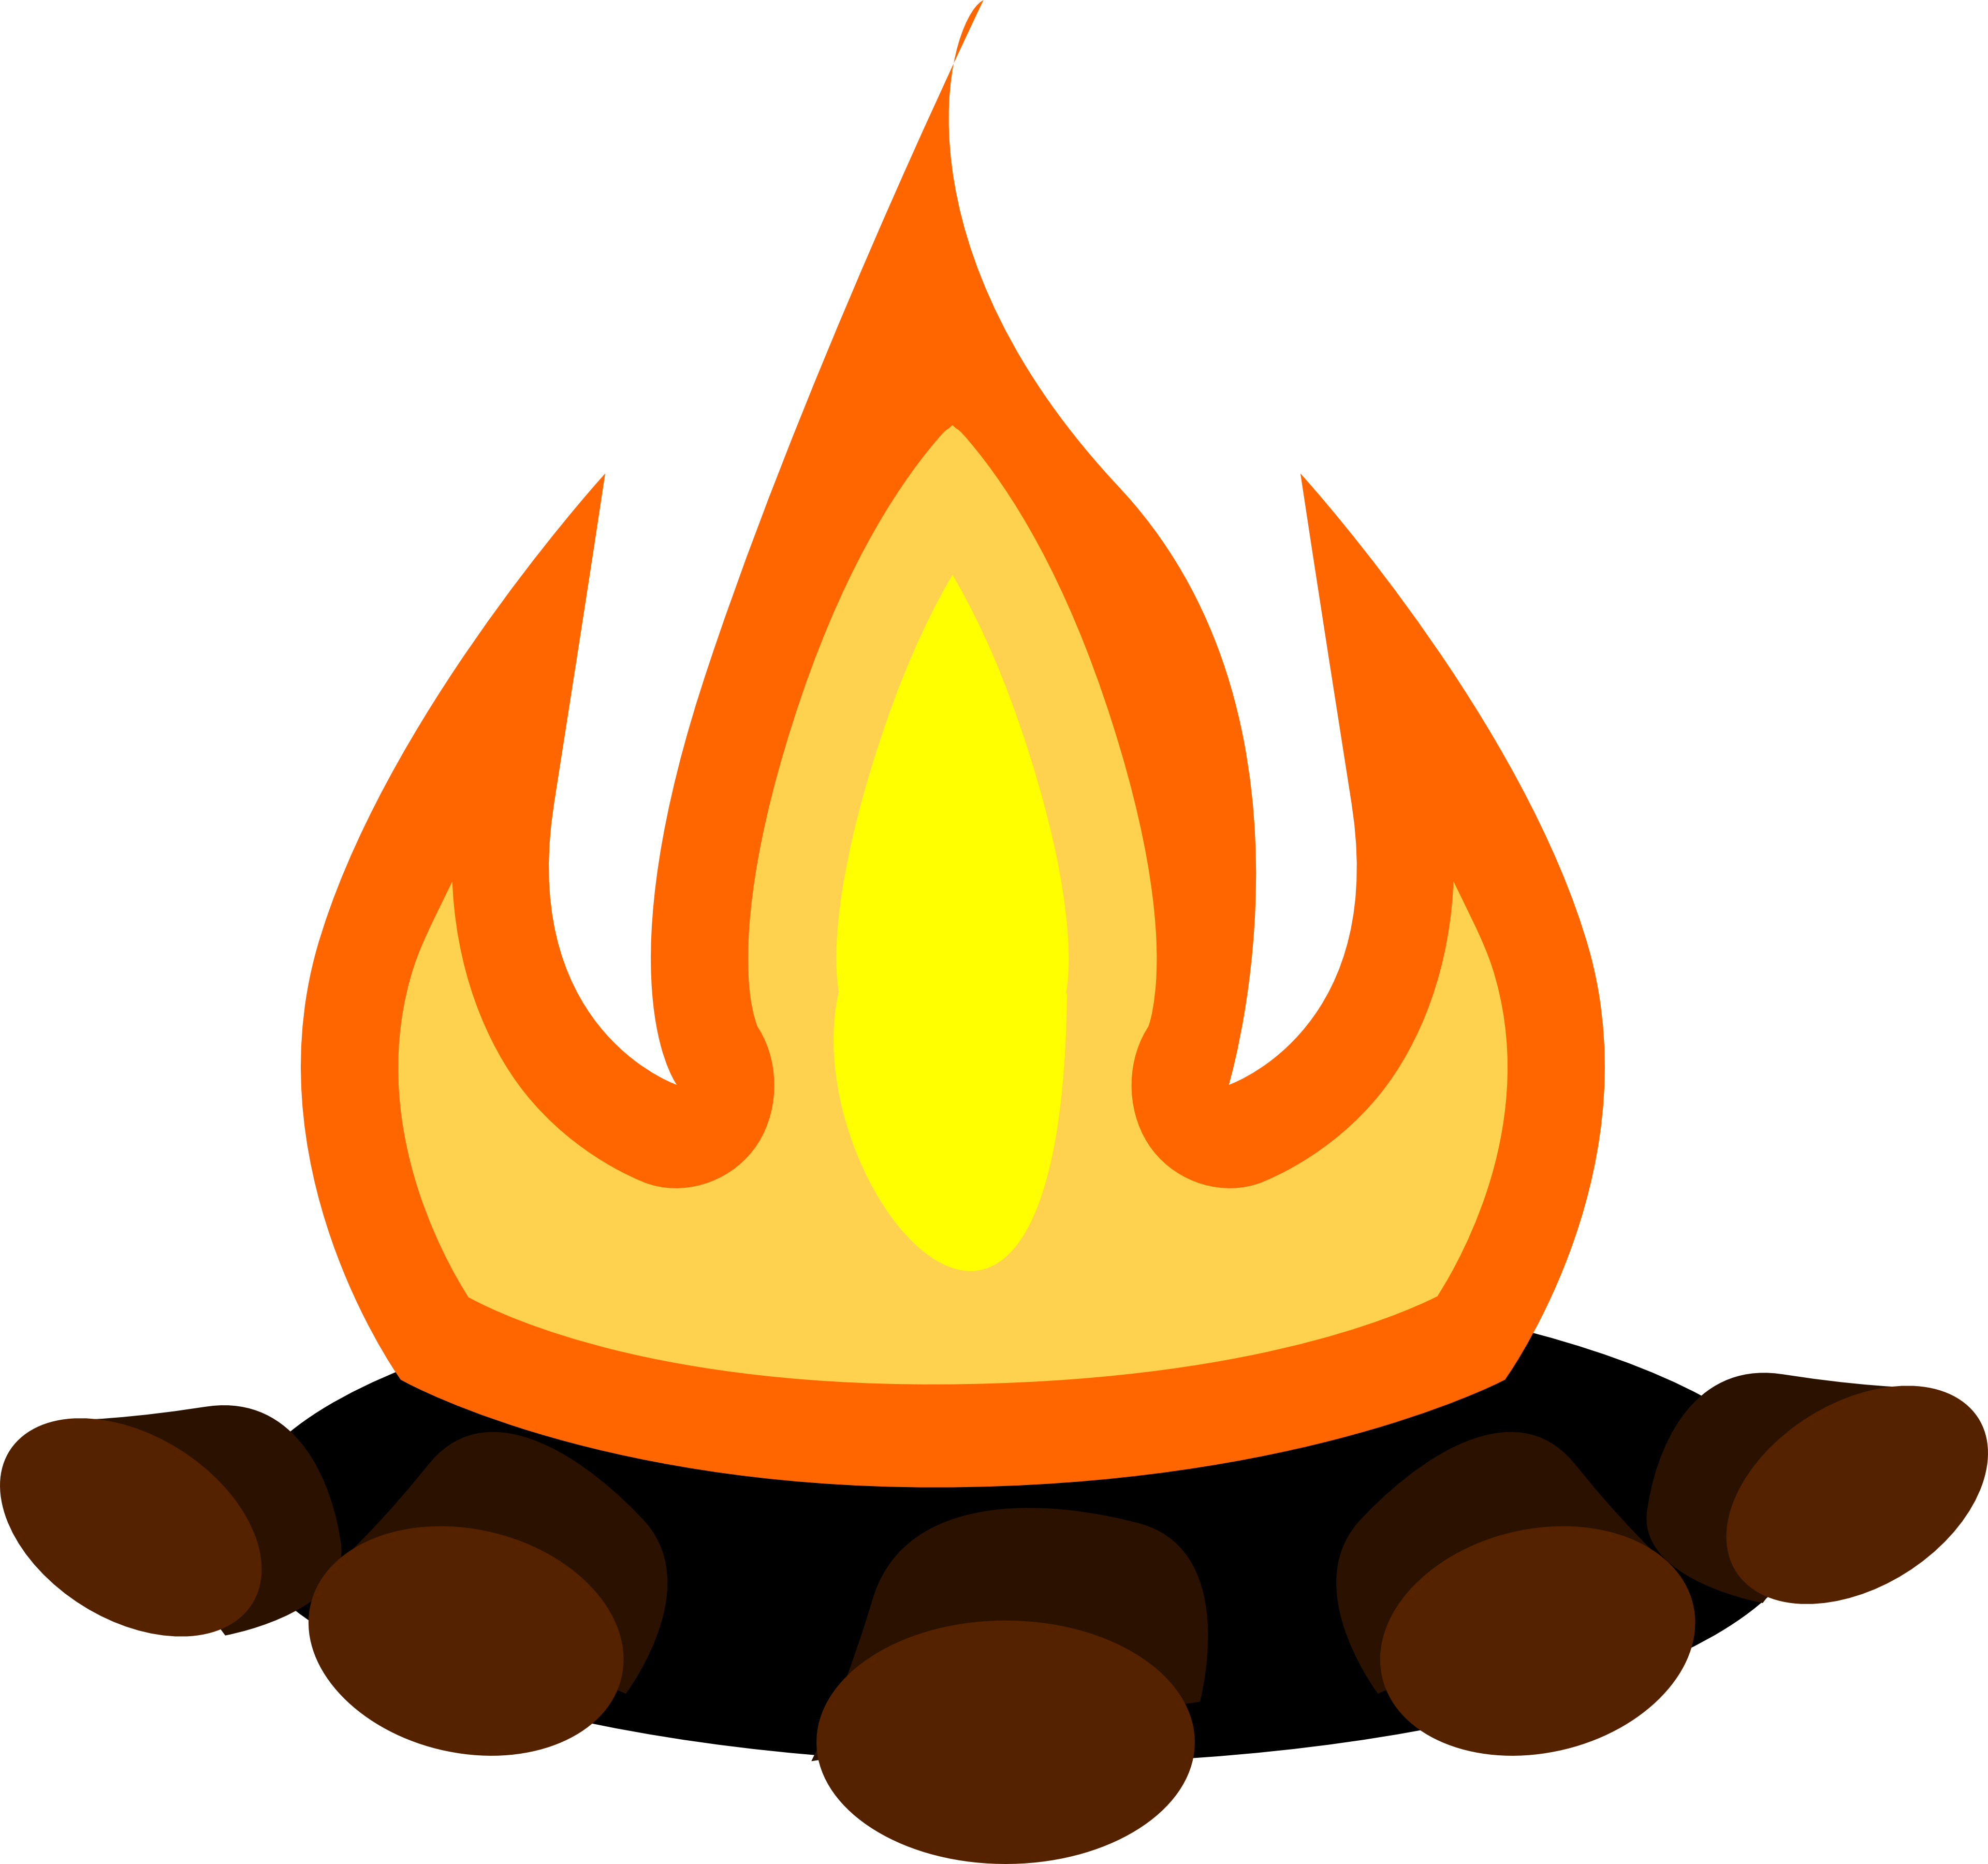 Bonfire PNG images free download